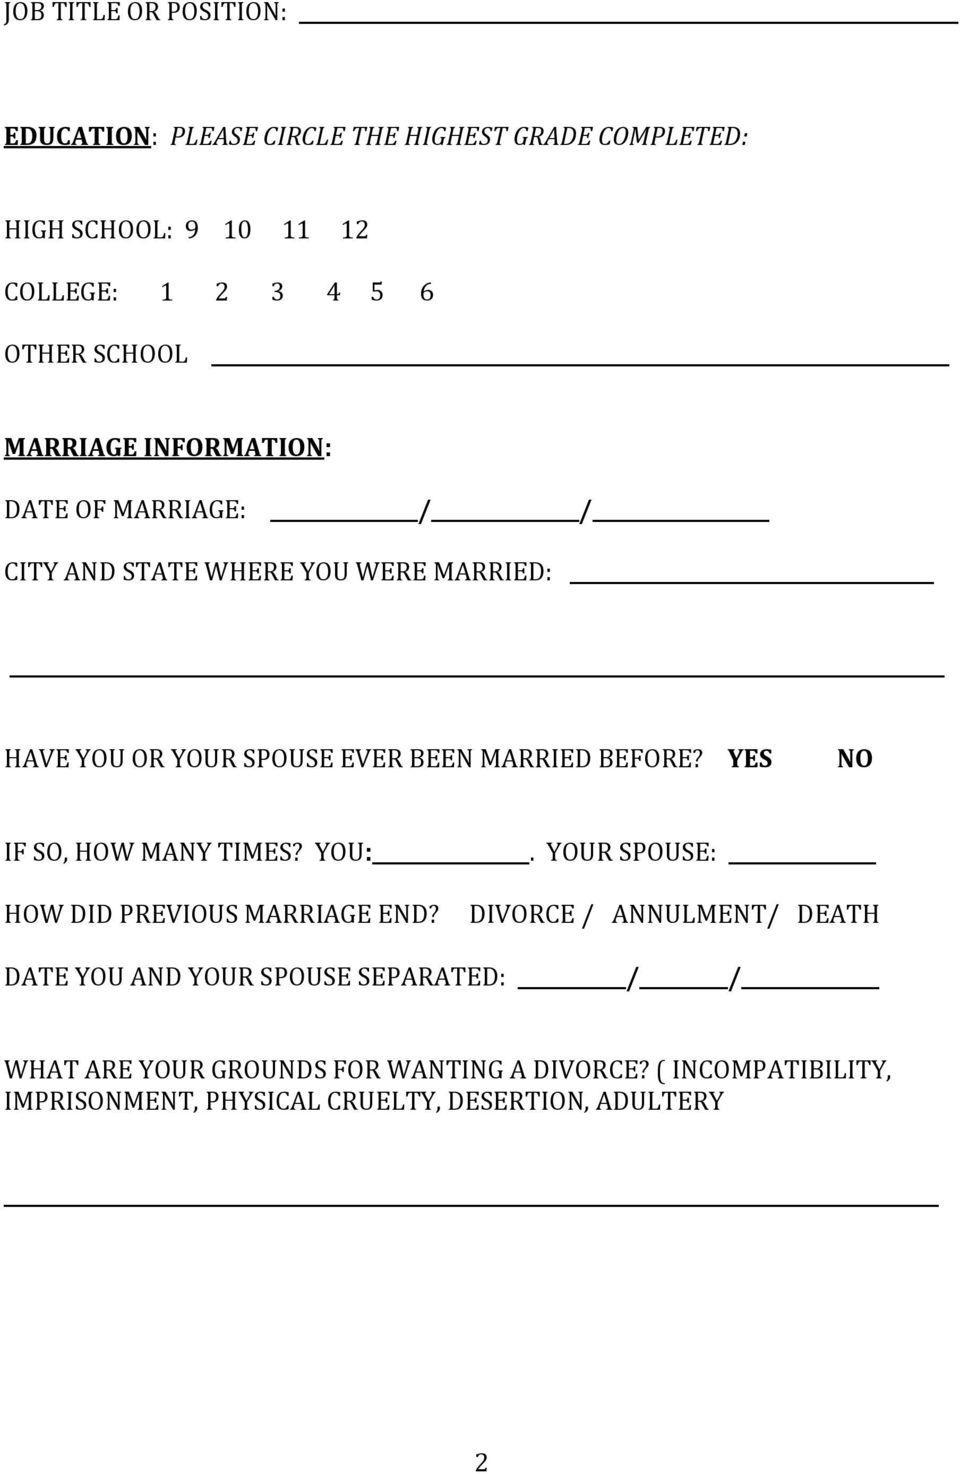 Montgomery Alabama Divorce Forms